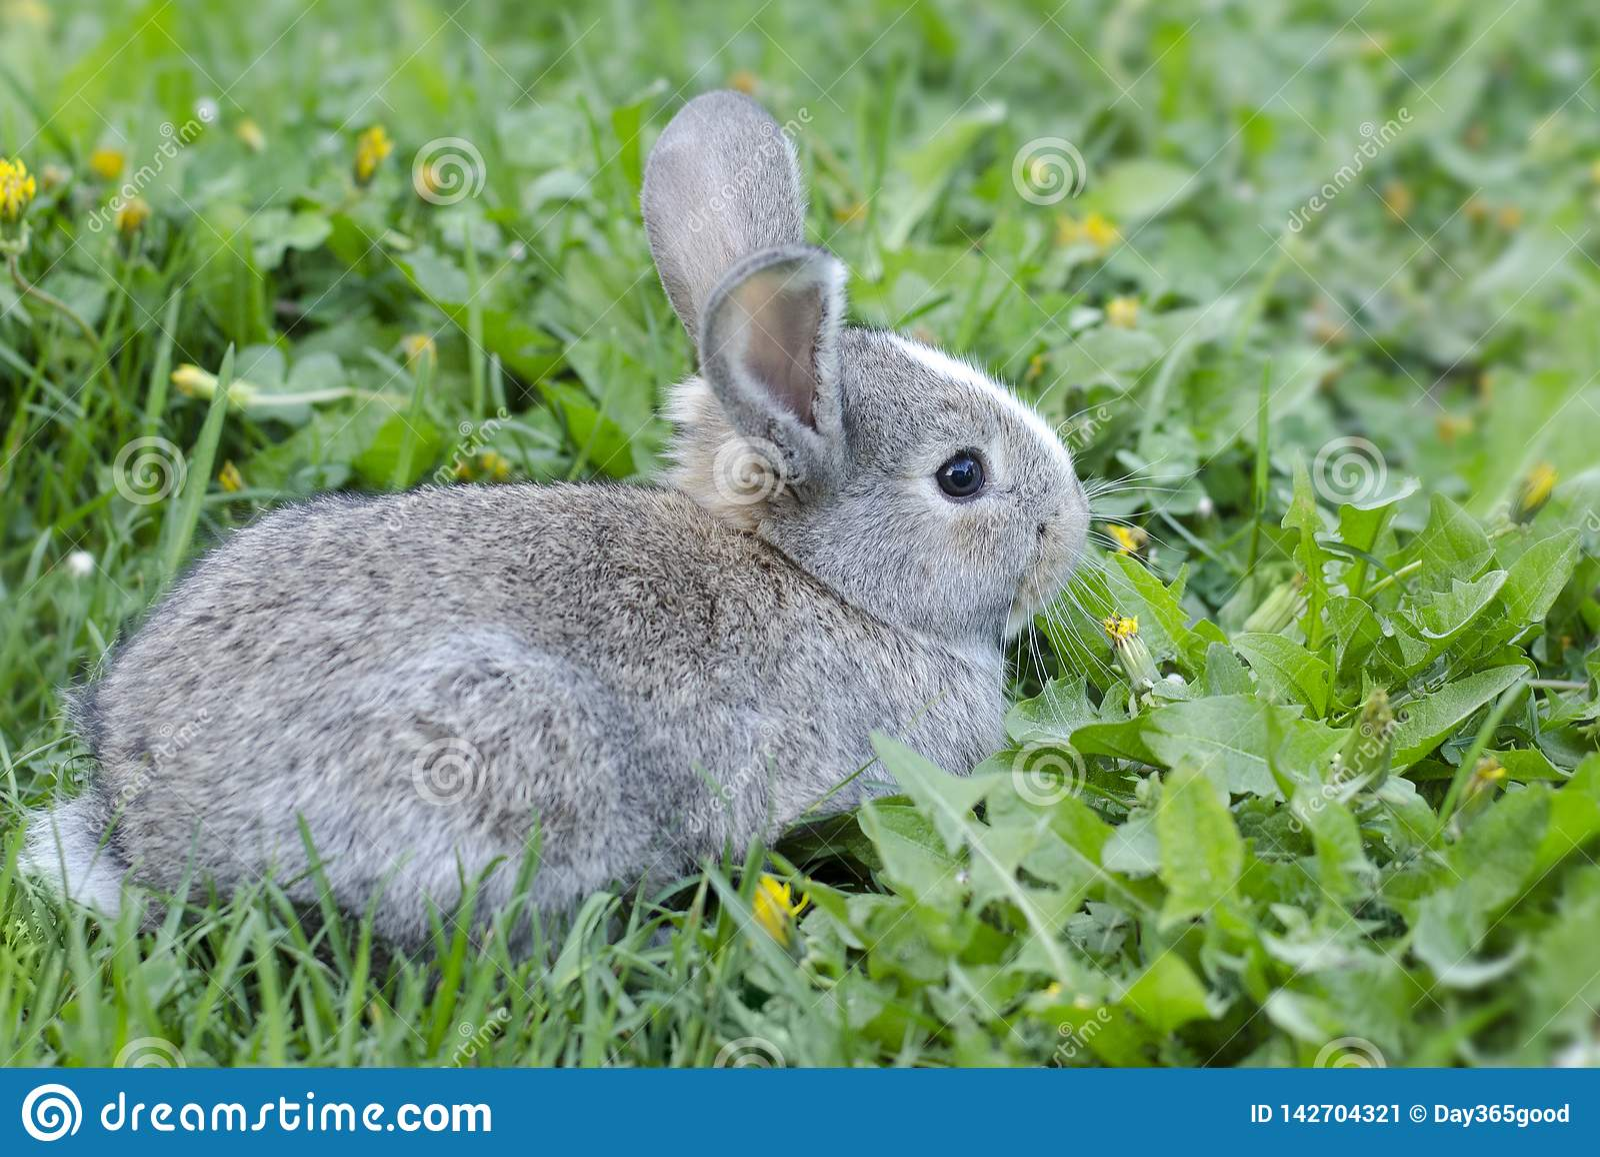 Liten kanin i grönt gräs Kanin i ängen Haren sitter i det gröna gräset